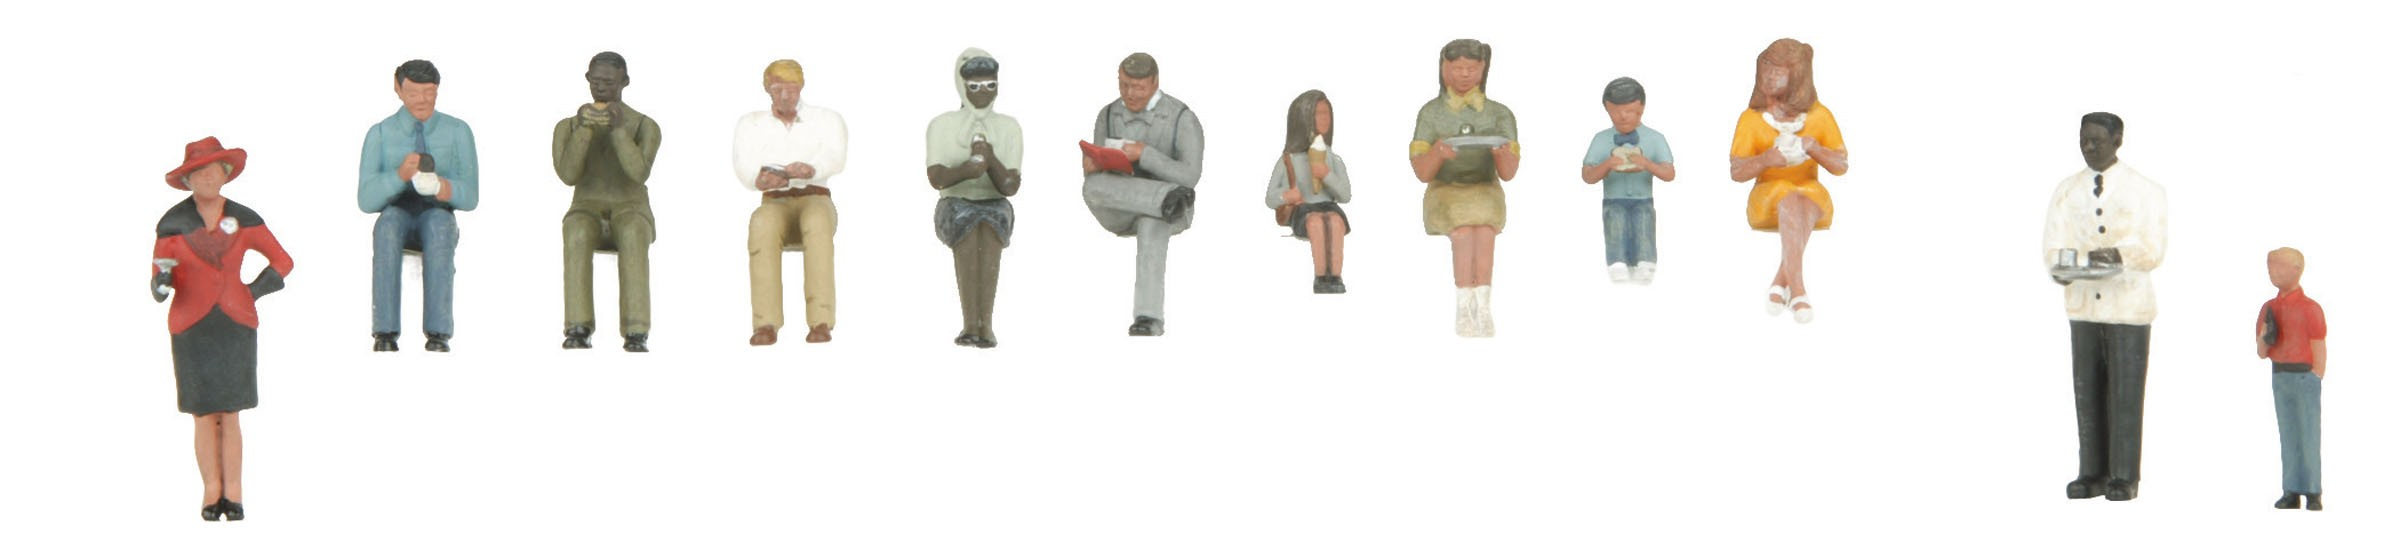 30-11067  Passenger Figure Set #3 - 12 pc